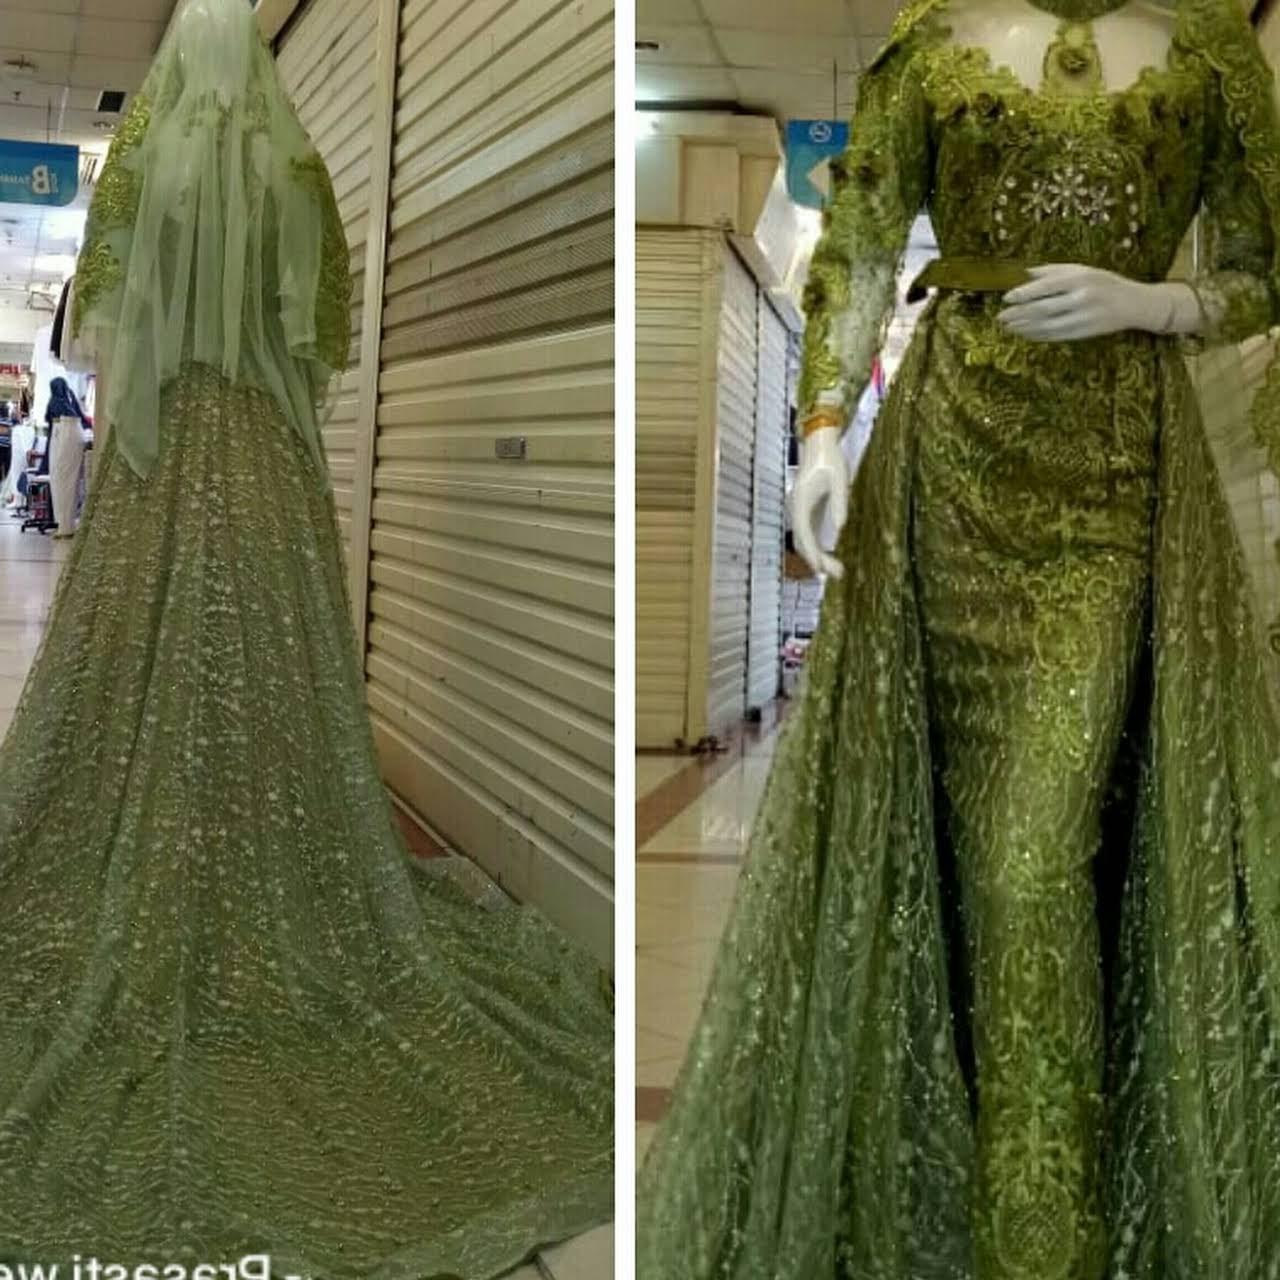 Design Sewa Baju Pengantin Muslimah Di Depok 9fdy Gaun Kebaya Pengantin Muslimah Hijab Syari Layanan Belanja